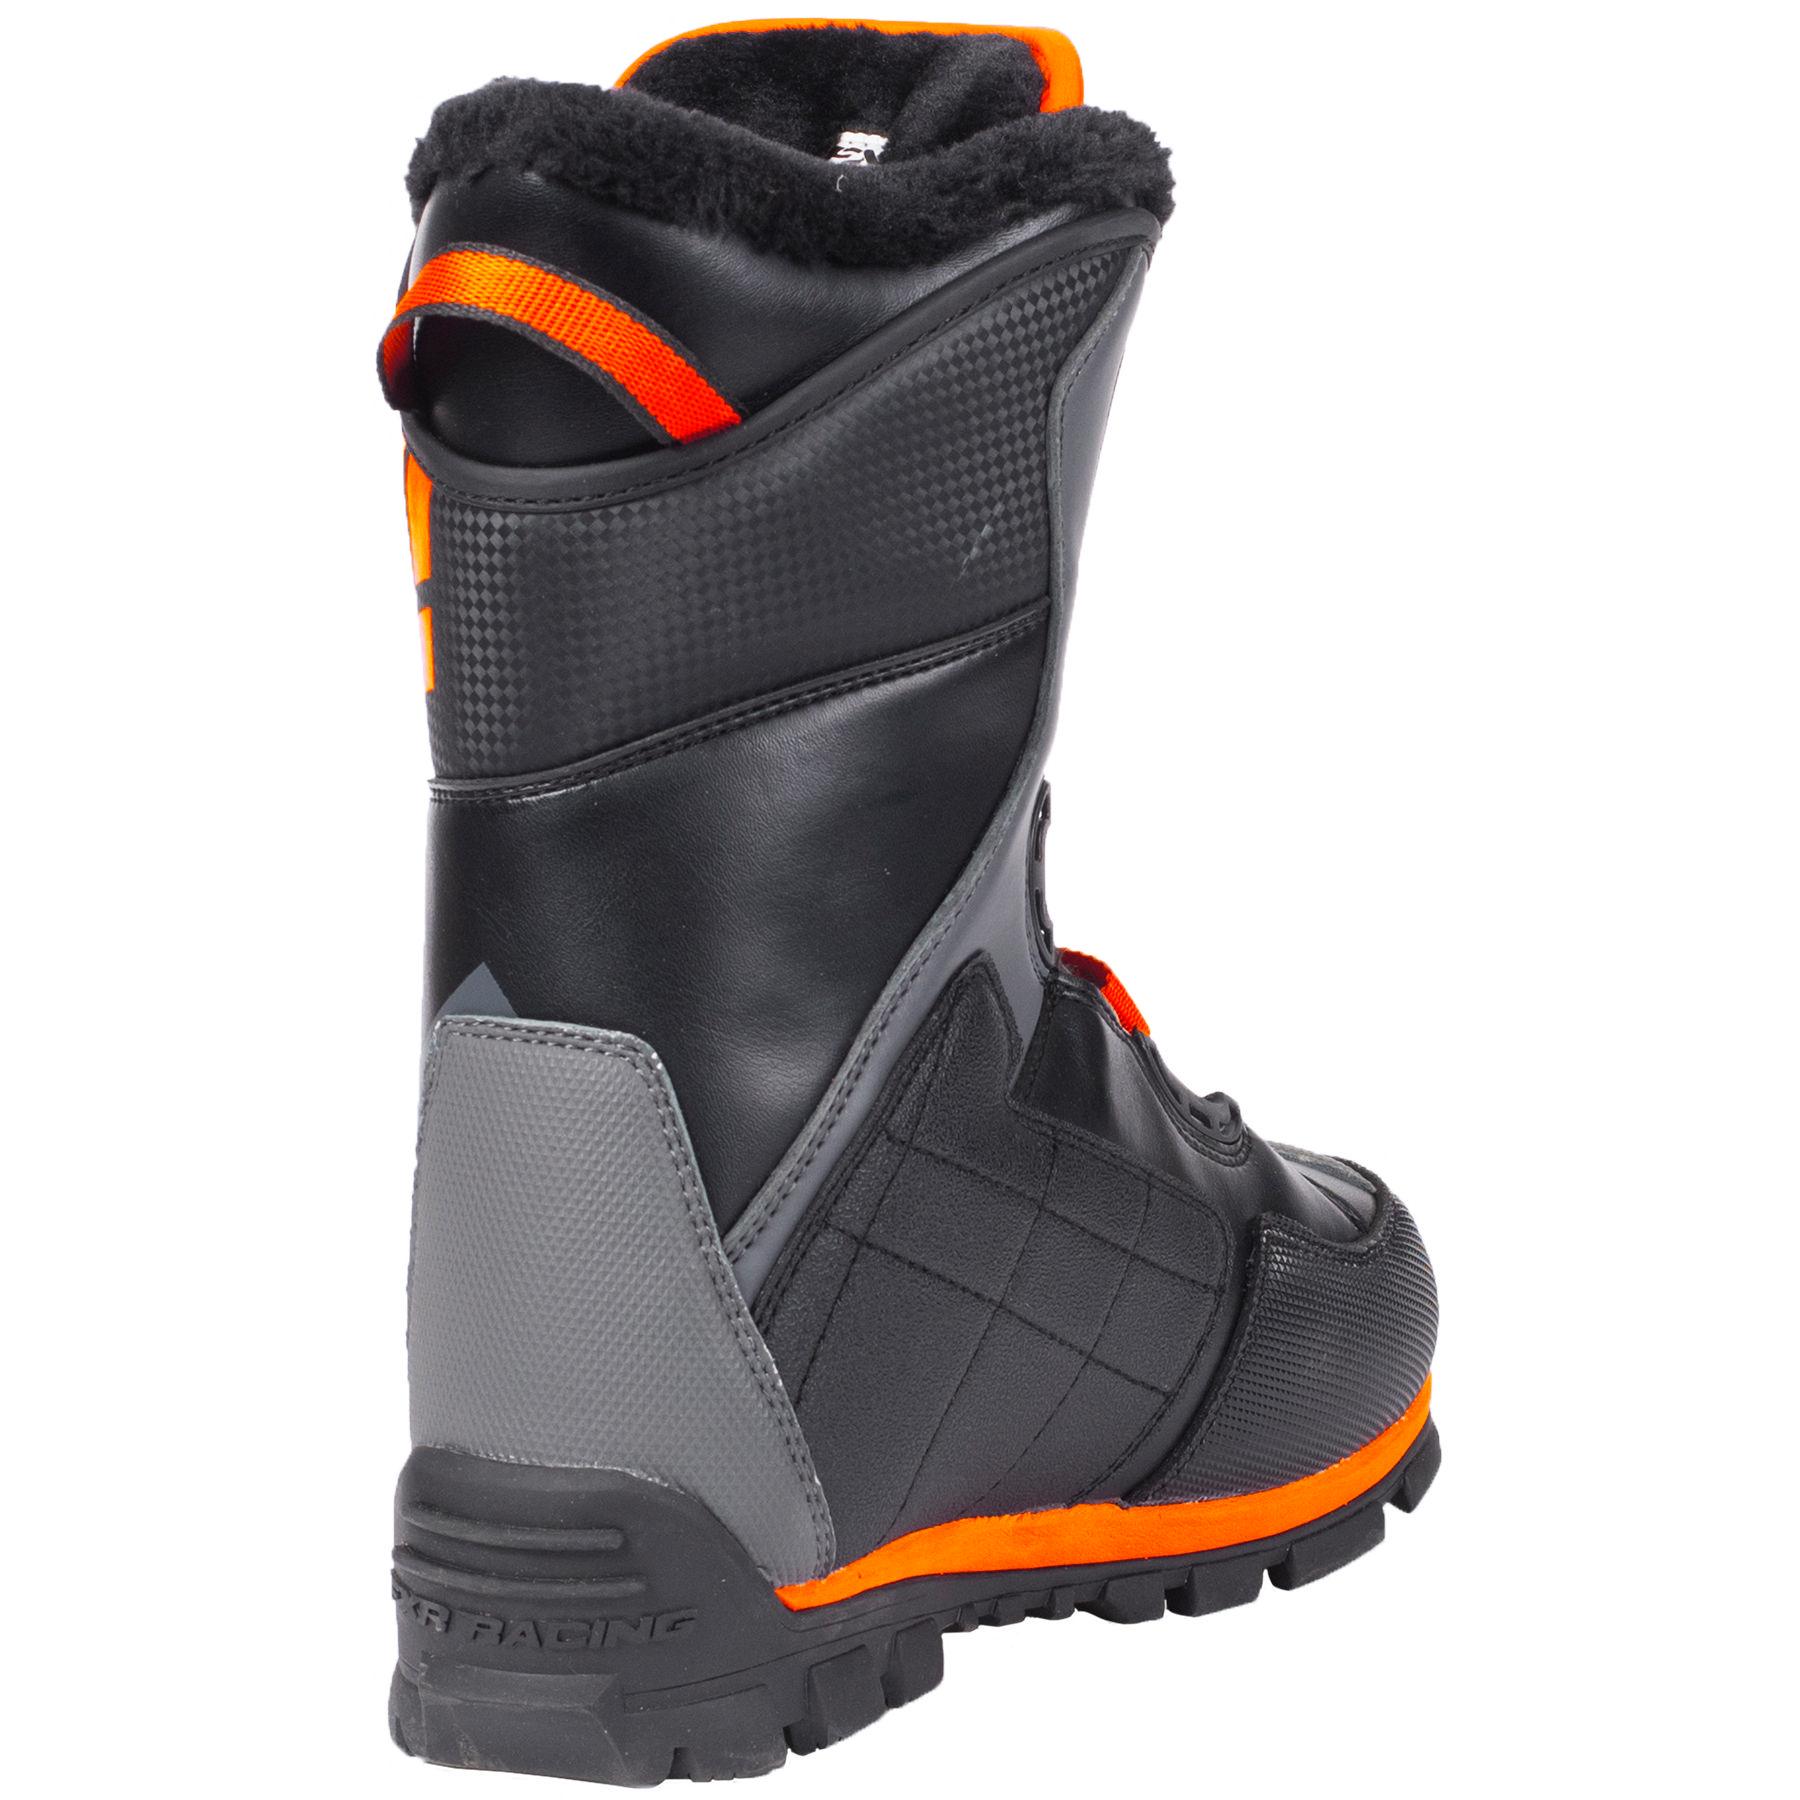 FXR X-Cross Speed Boot Black/Orange Size 11/45 Boots Automotive ...